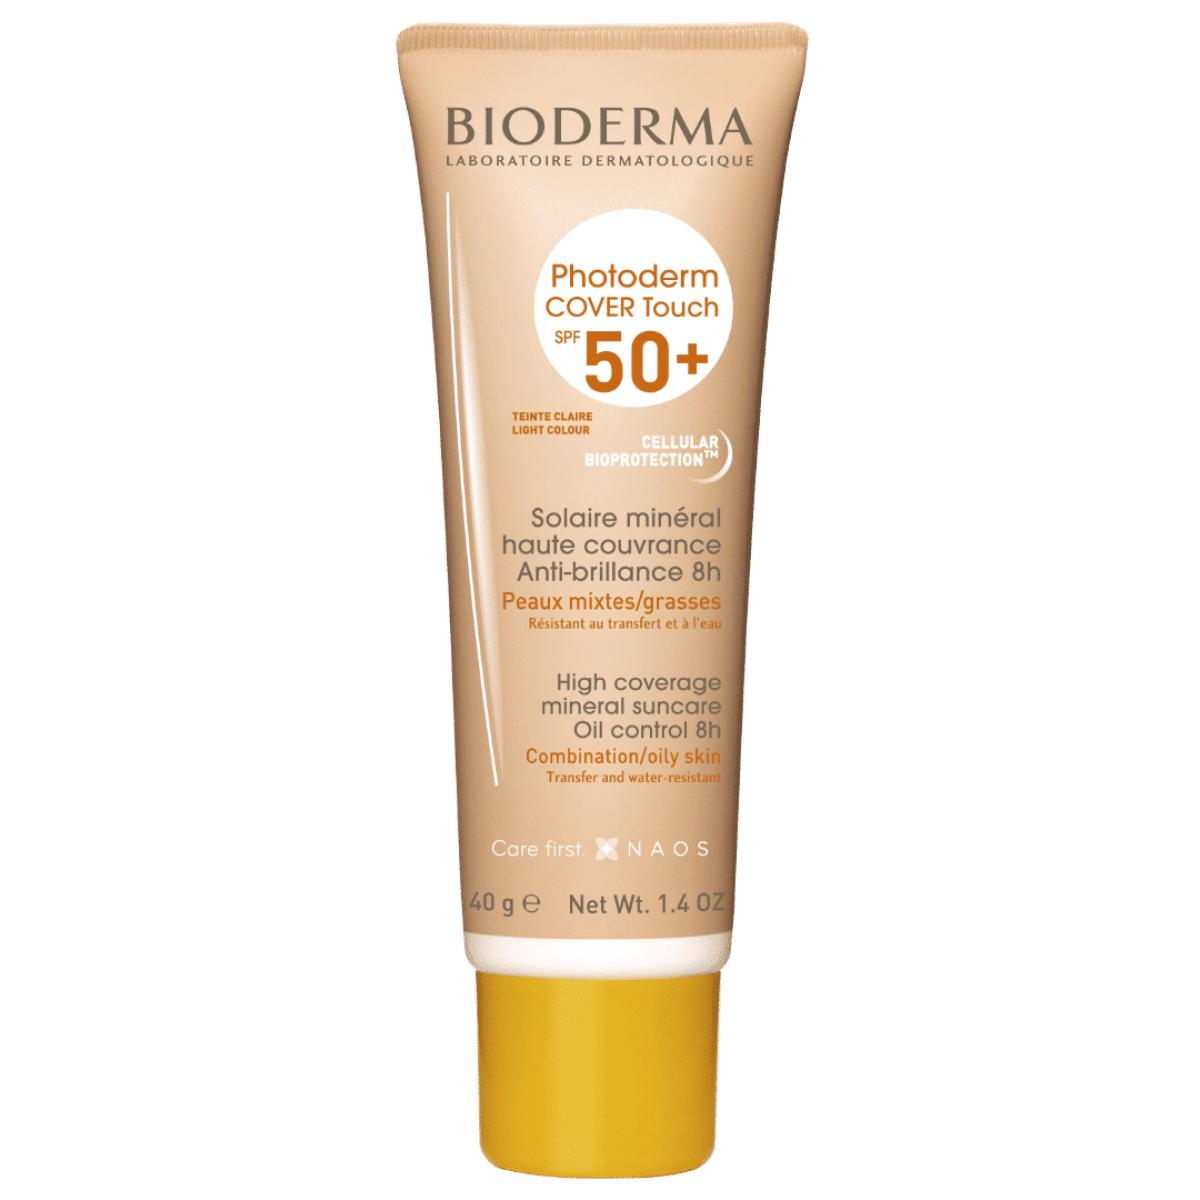 BIODERMA Photoderm Cover Touch SPF 50+ gaiši tonēts saules aizsarglīdzeklis 40g